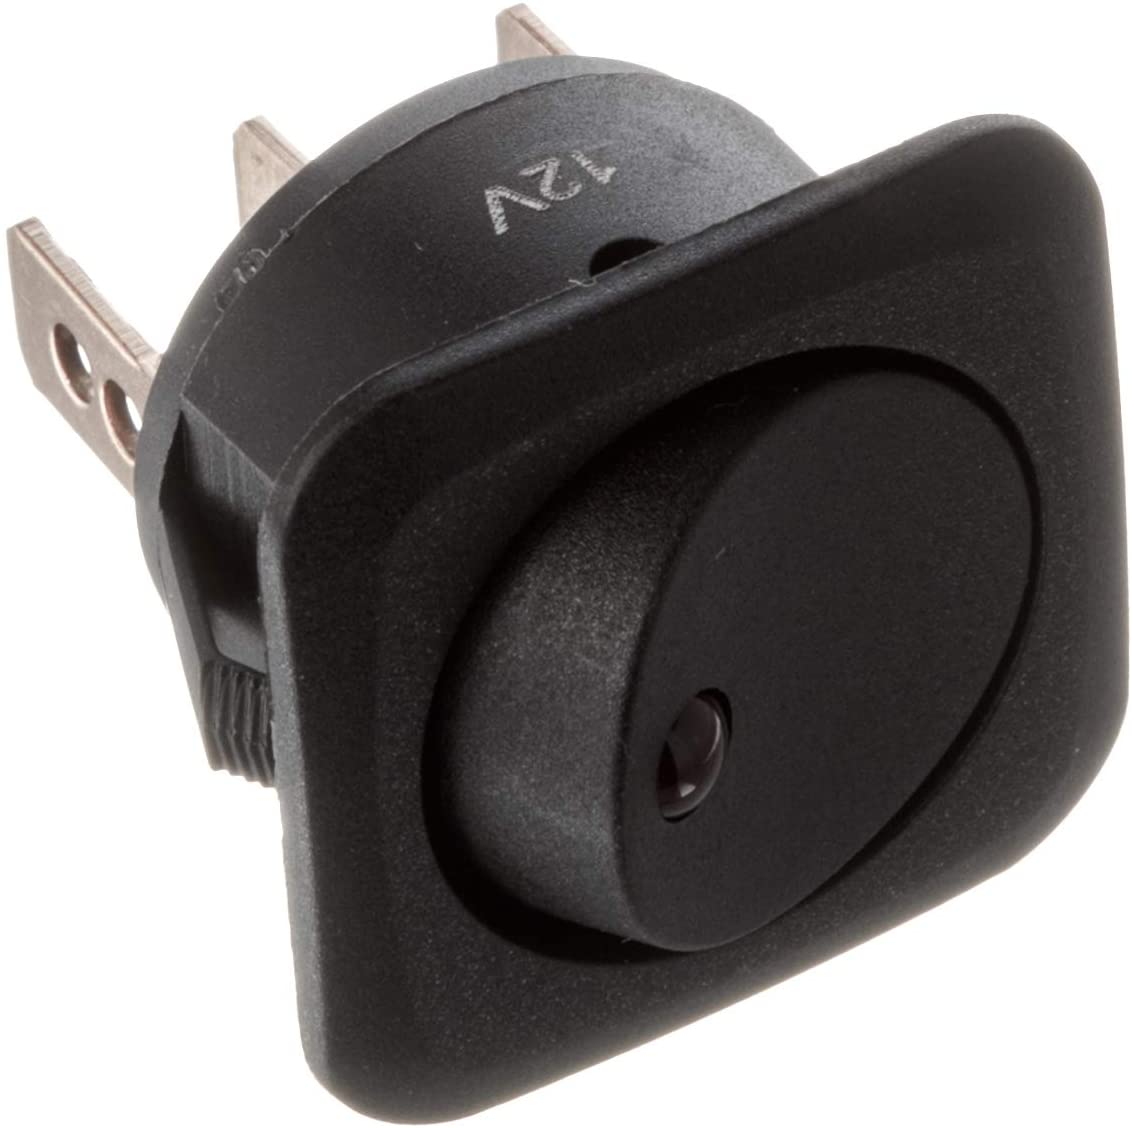 Calterm 40600 Switch, 25A Rocker, Red